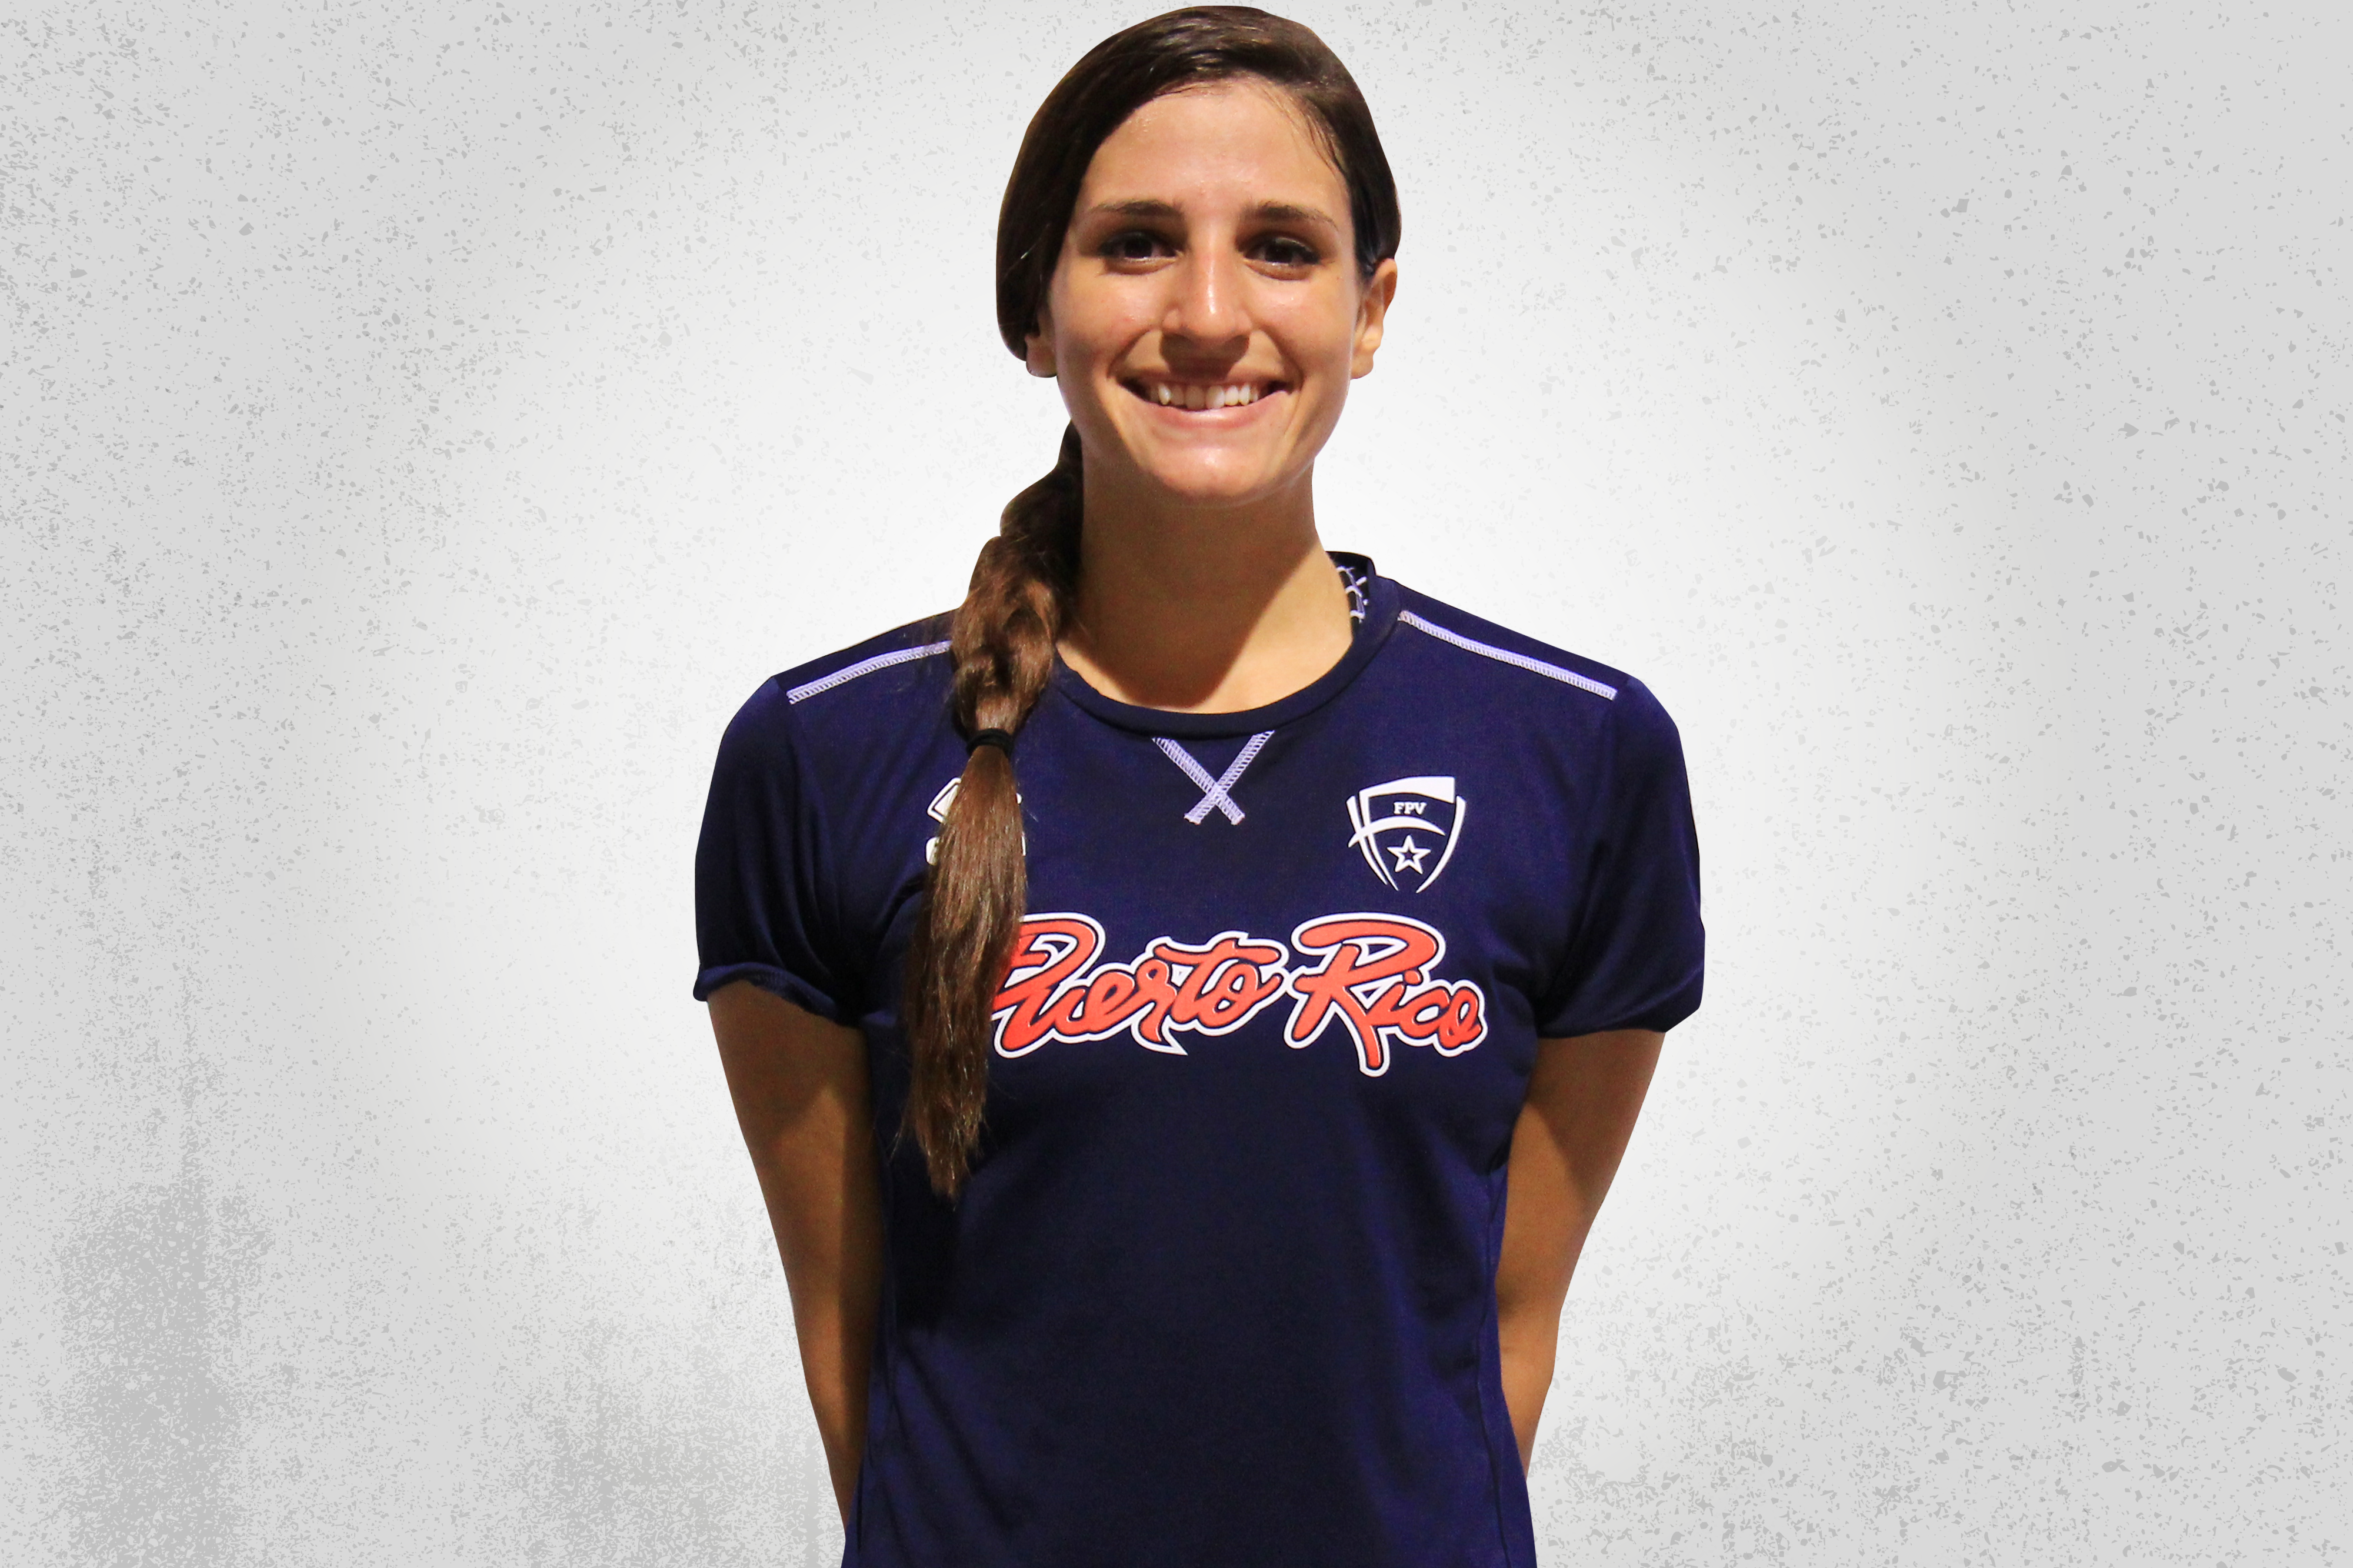 Jennifer Nogueras